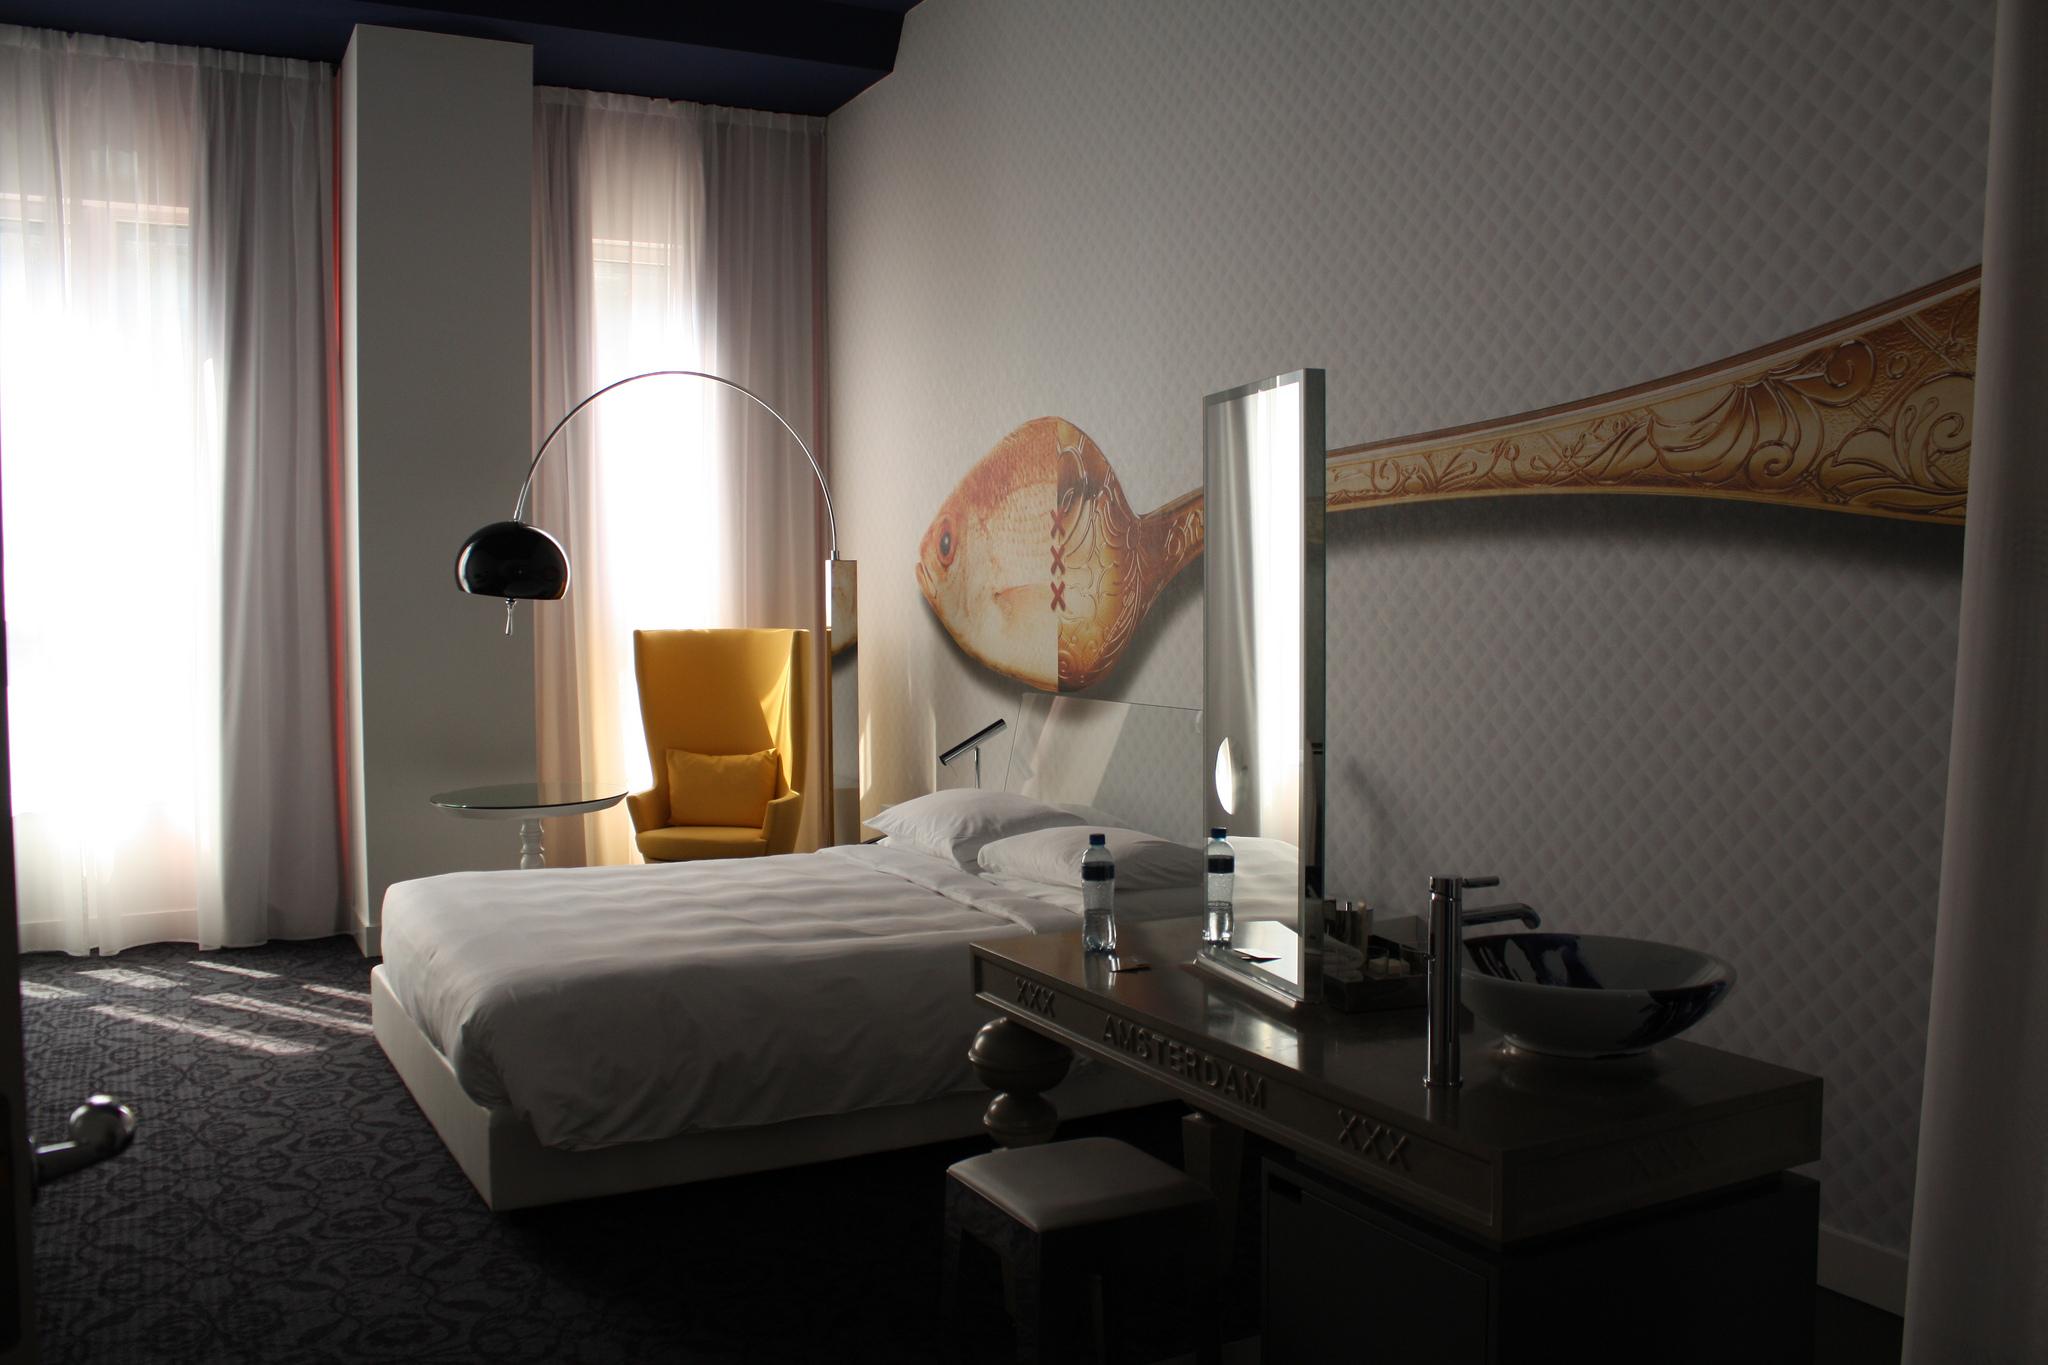 hotels boston hospitality review boston university